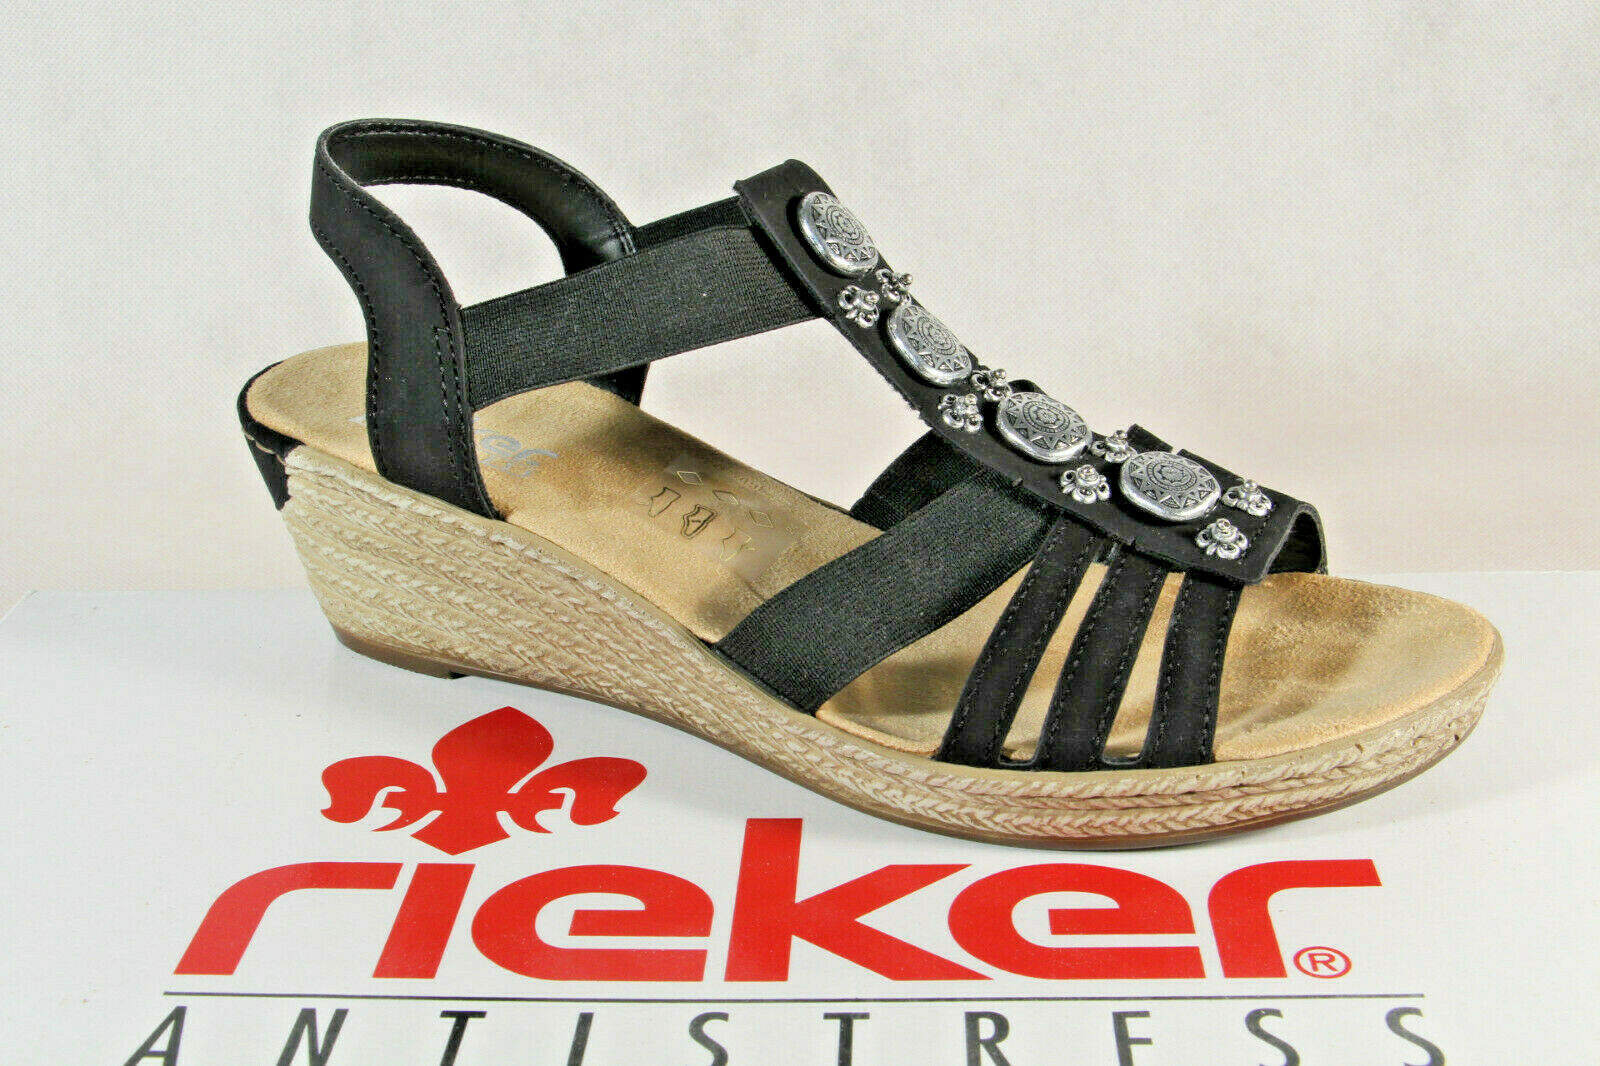 Rieker Damen Sandalen Sandaletten Sandale schwarz 624B4 Keilabsatz NEU